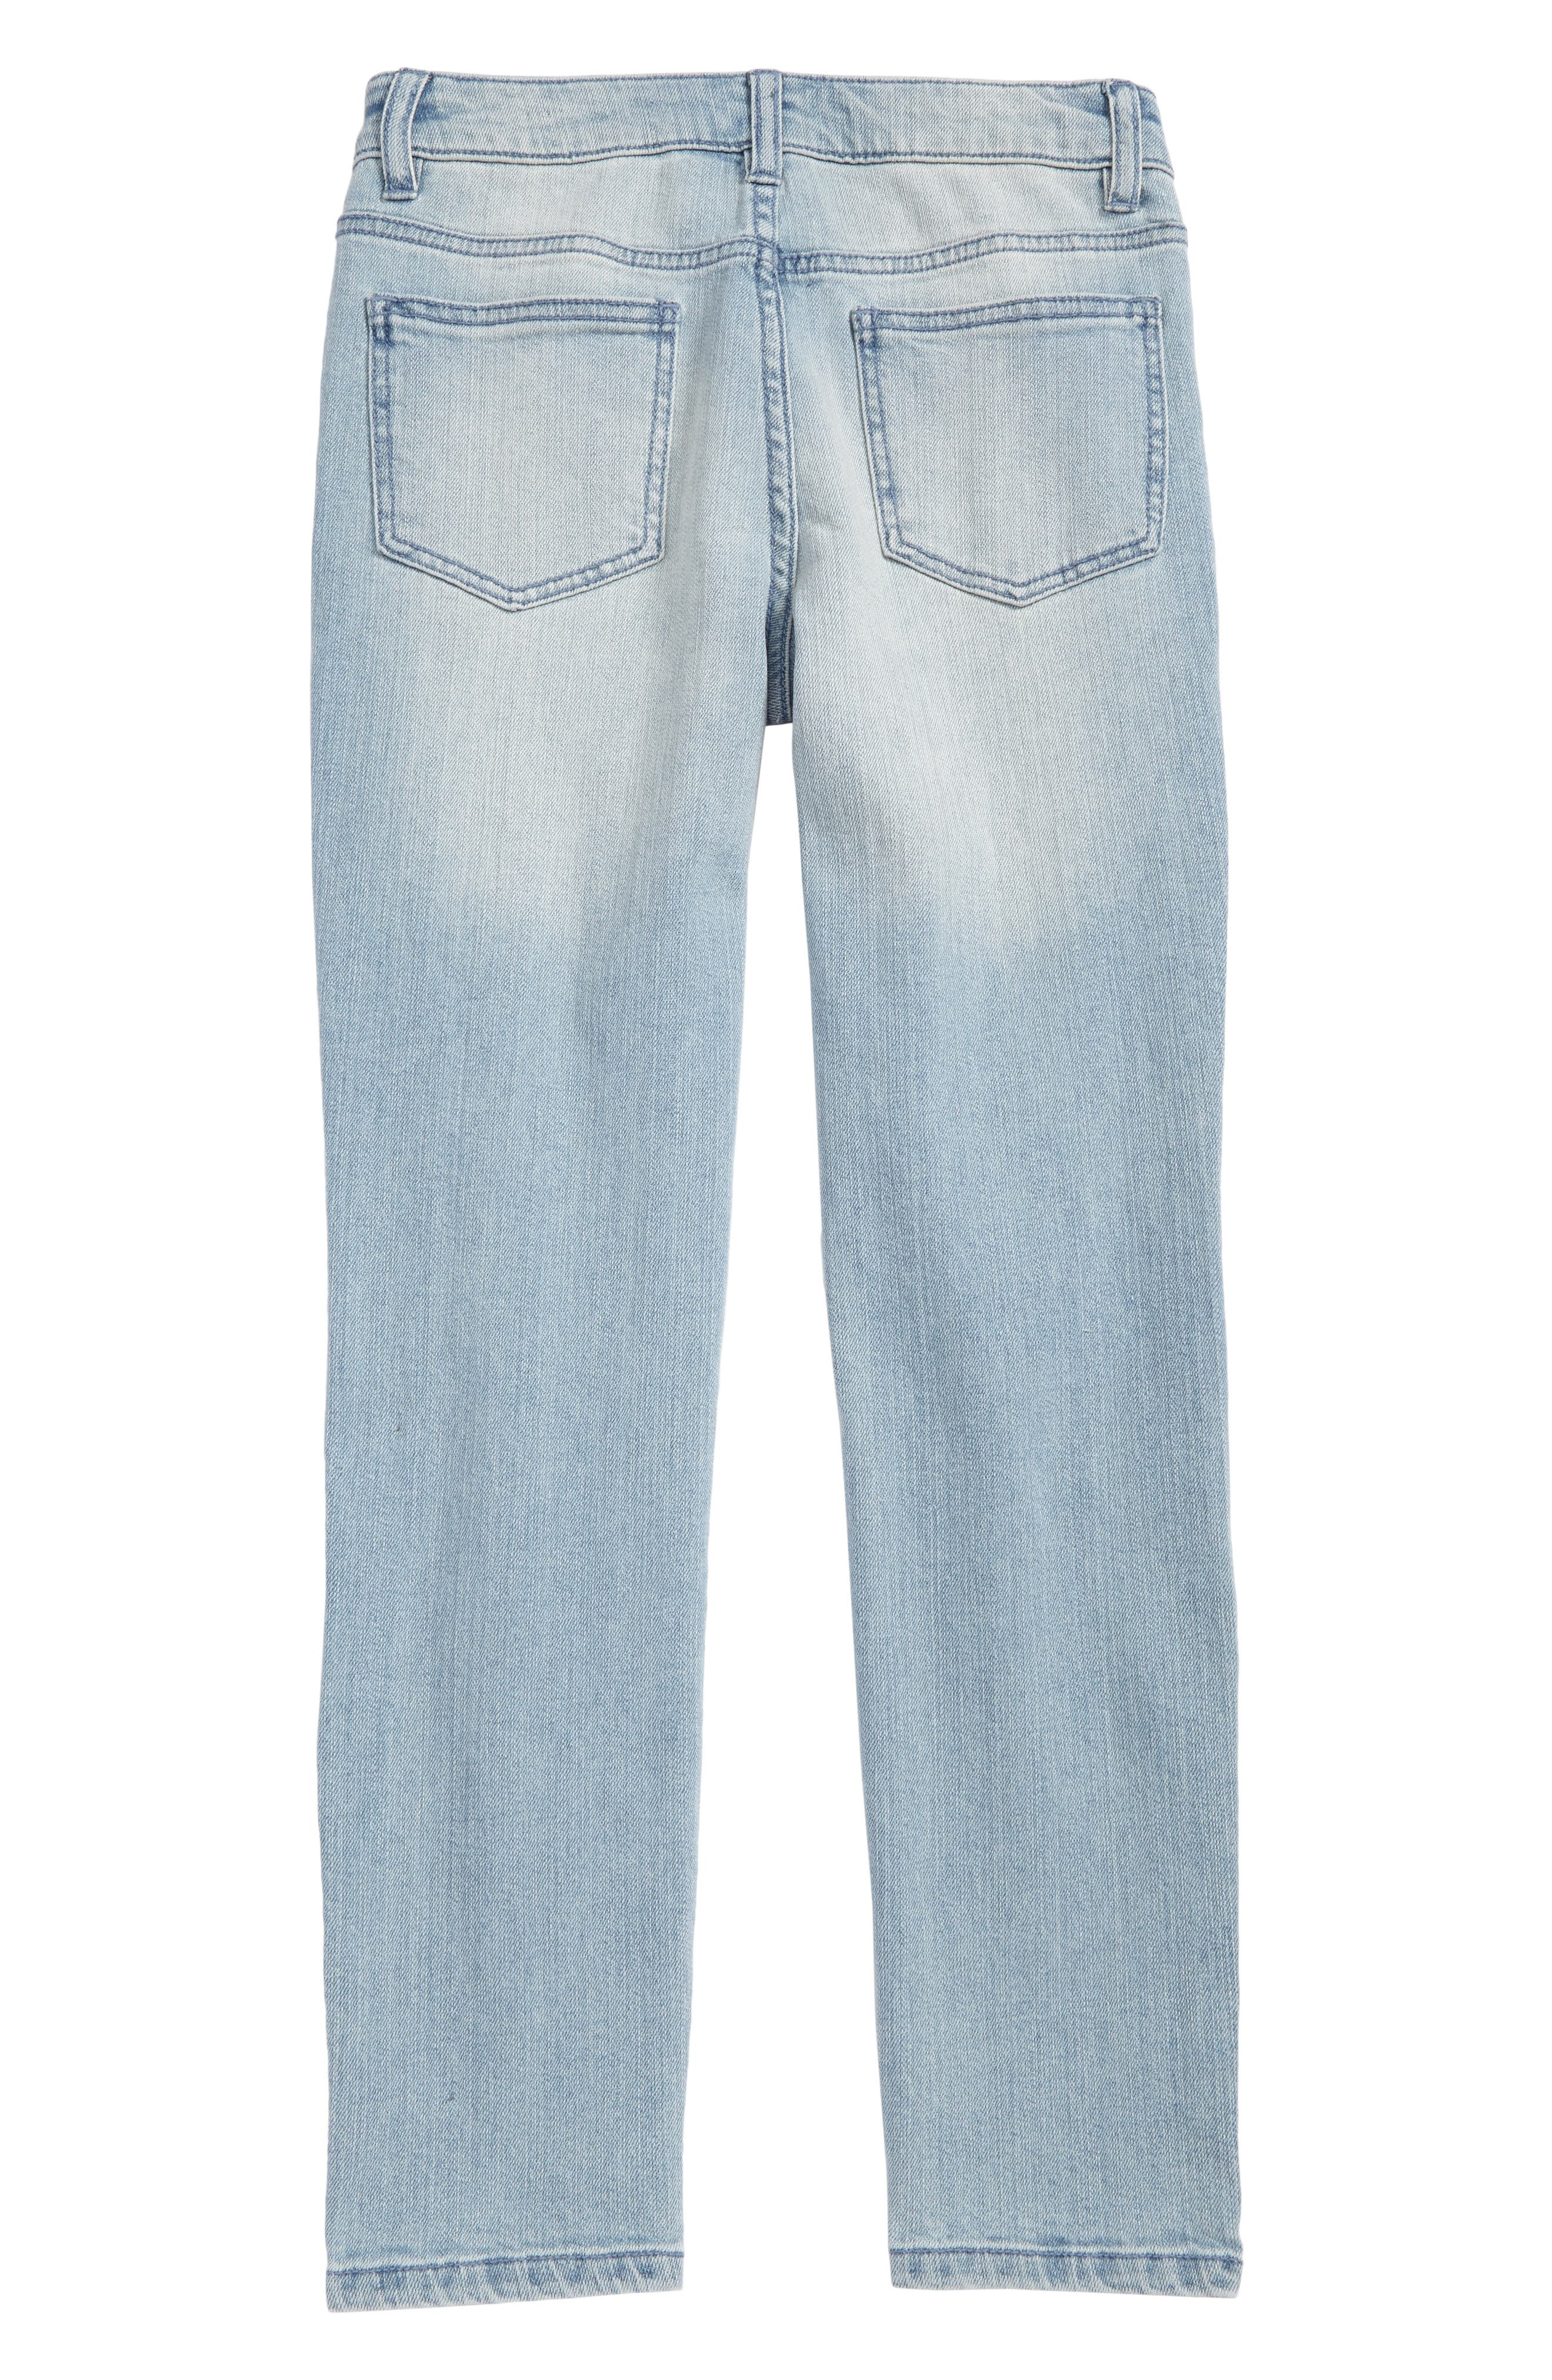 Alternate Image 2  - Elwood Rip & Repair Straight Leg Jeans (Big Boys)